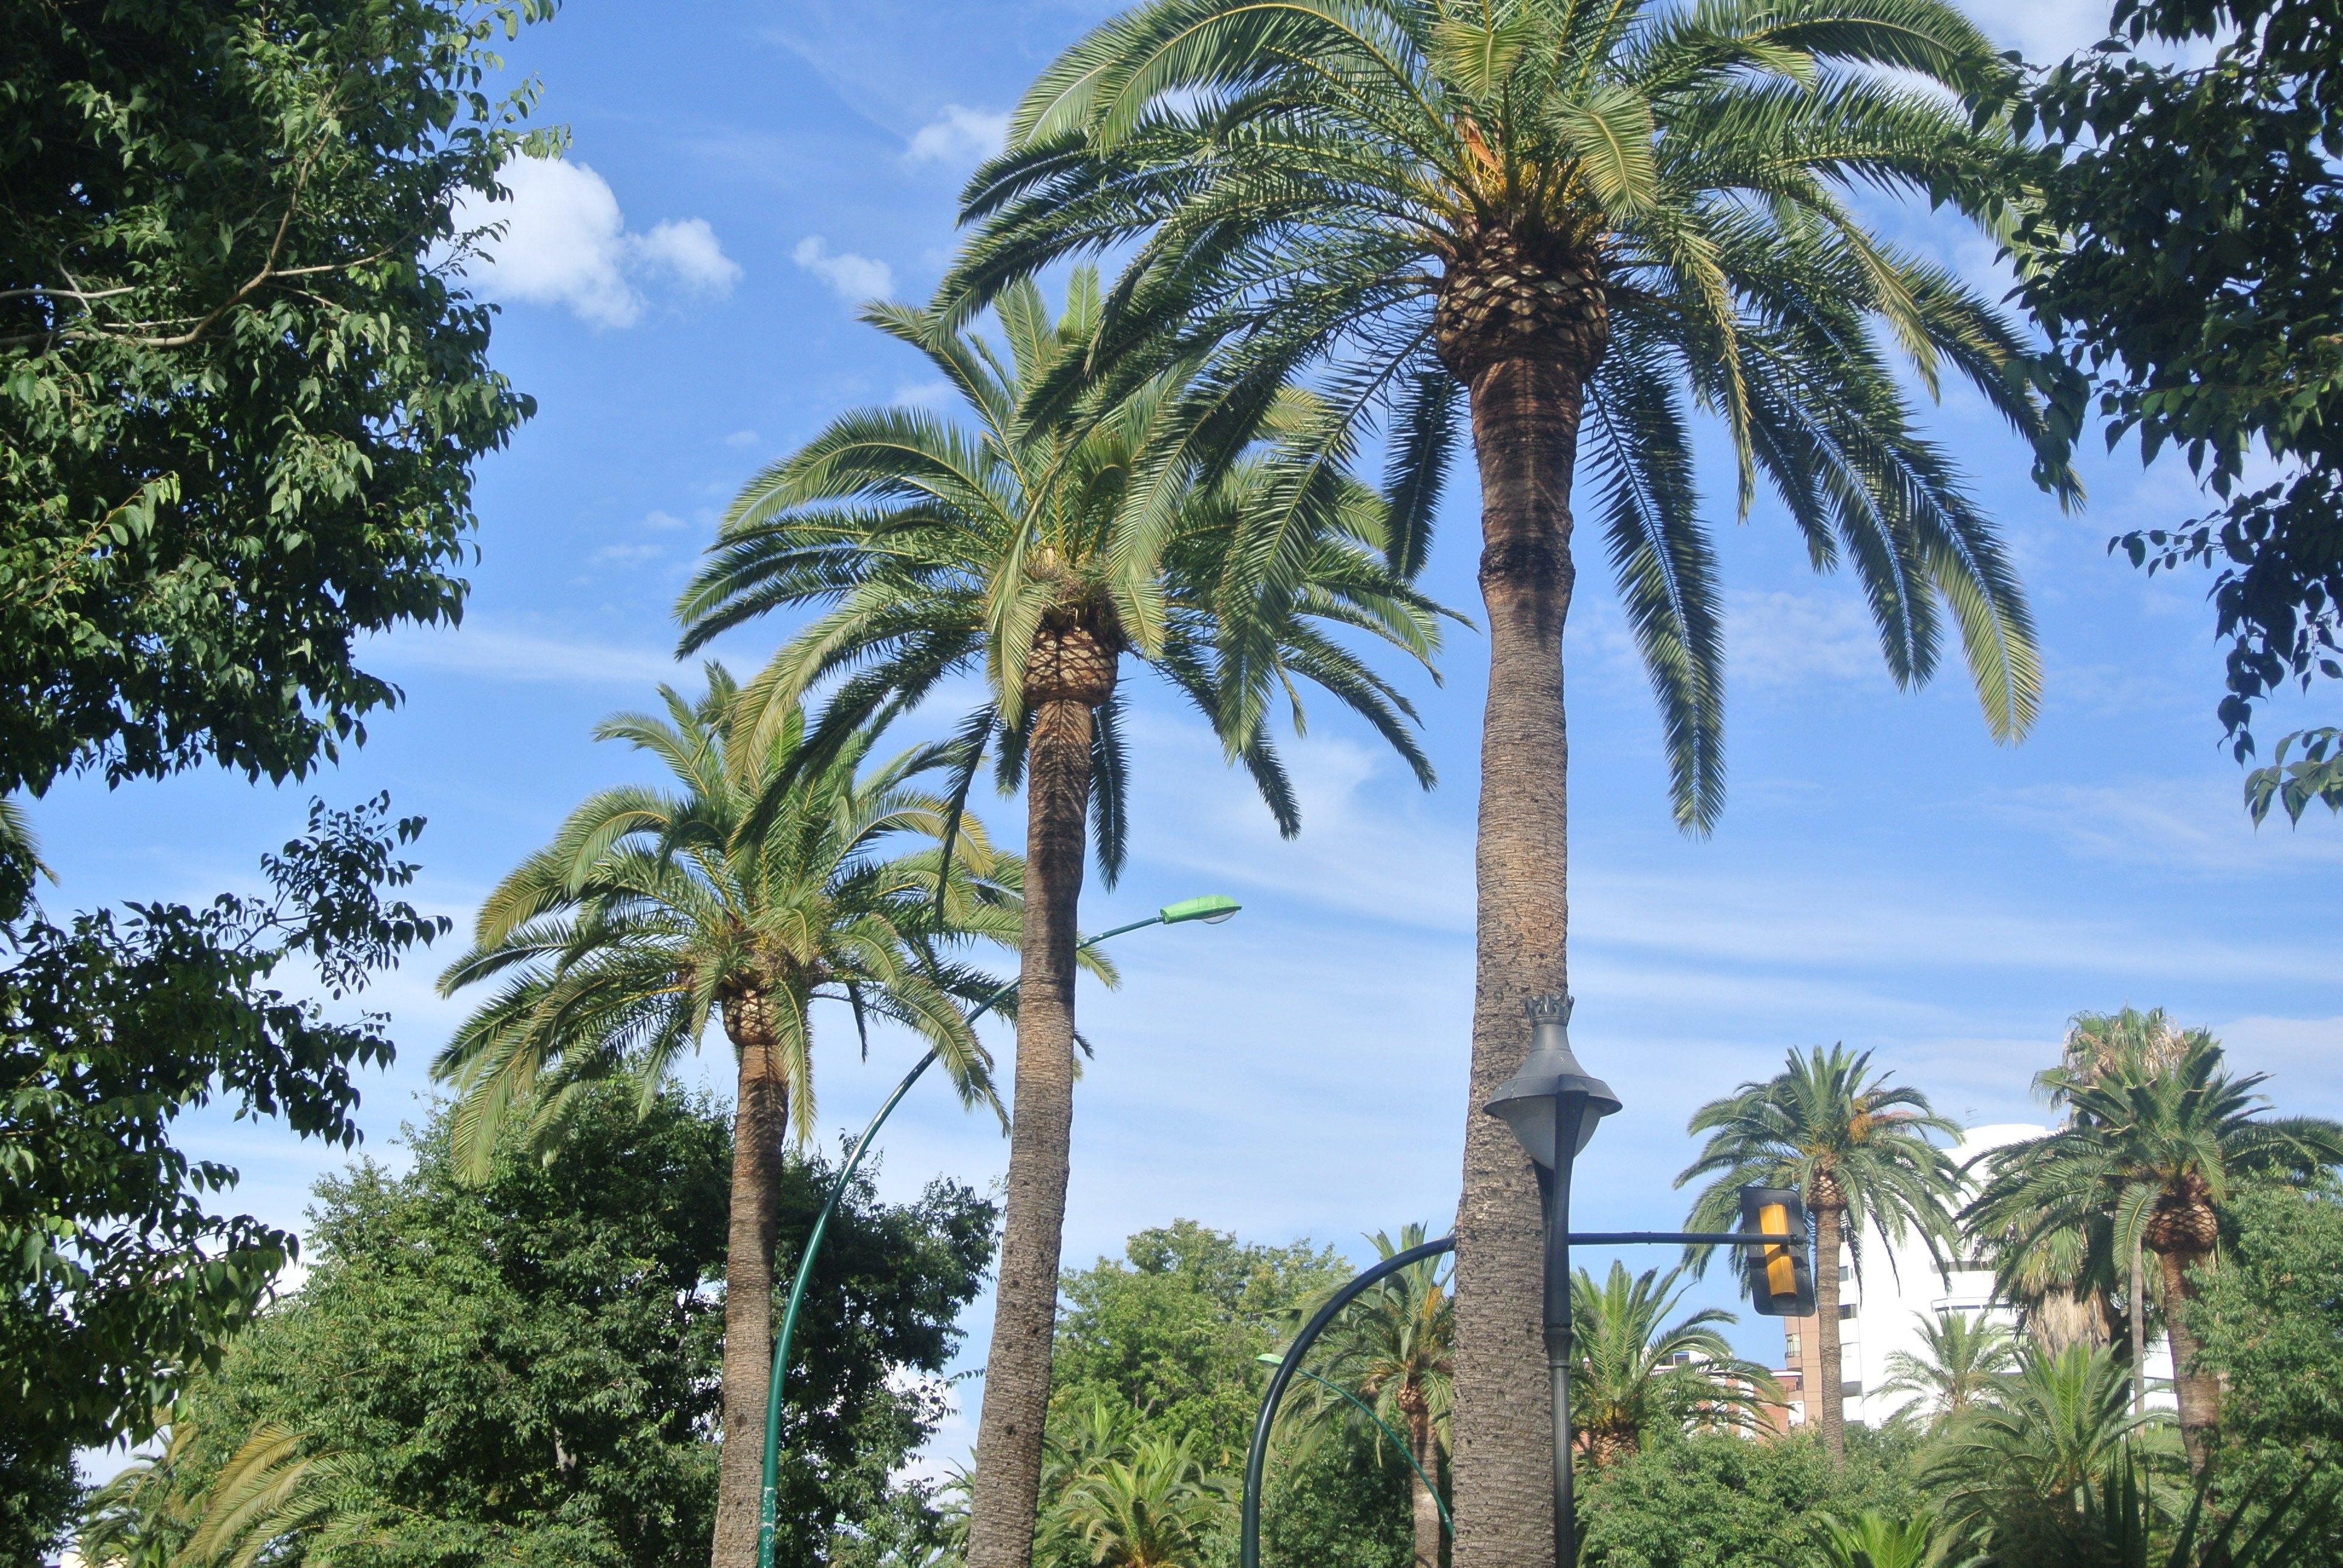 Malaga, Spain | Todd's Travels Travel Blog